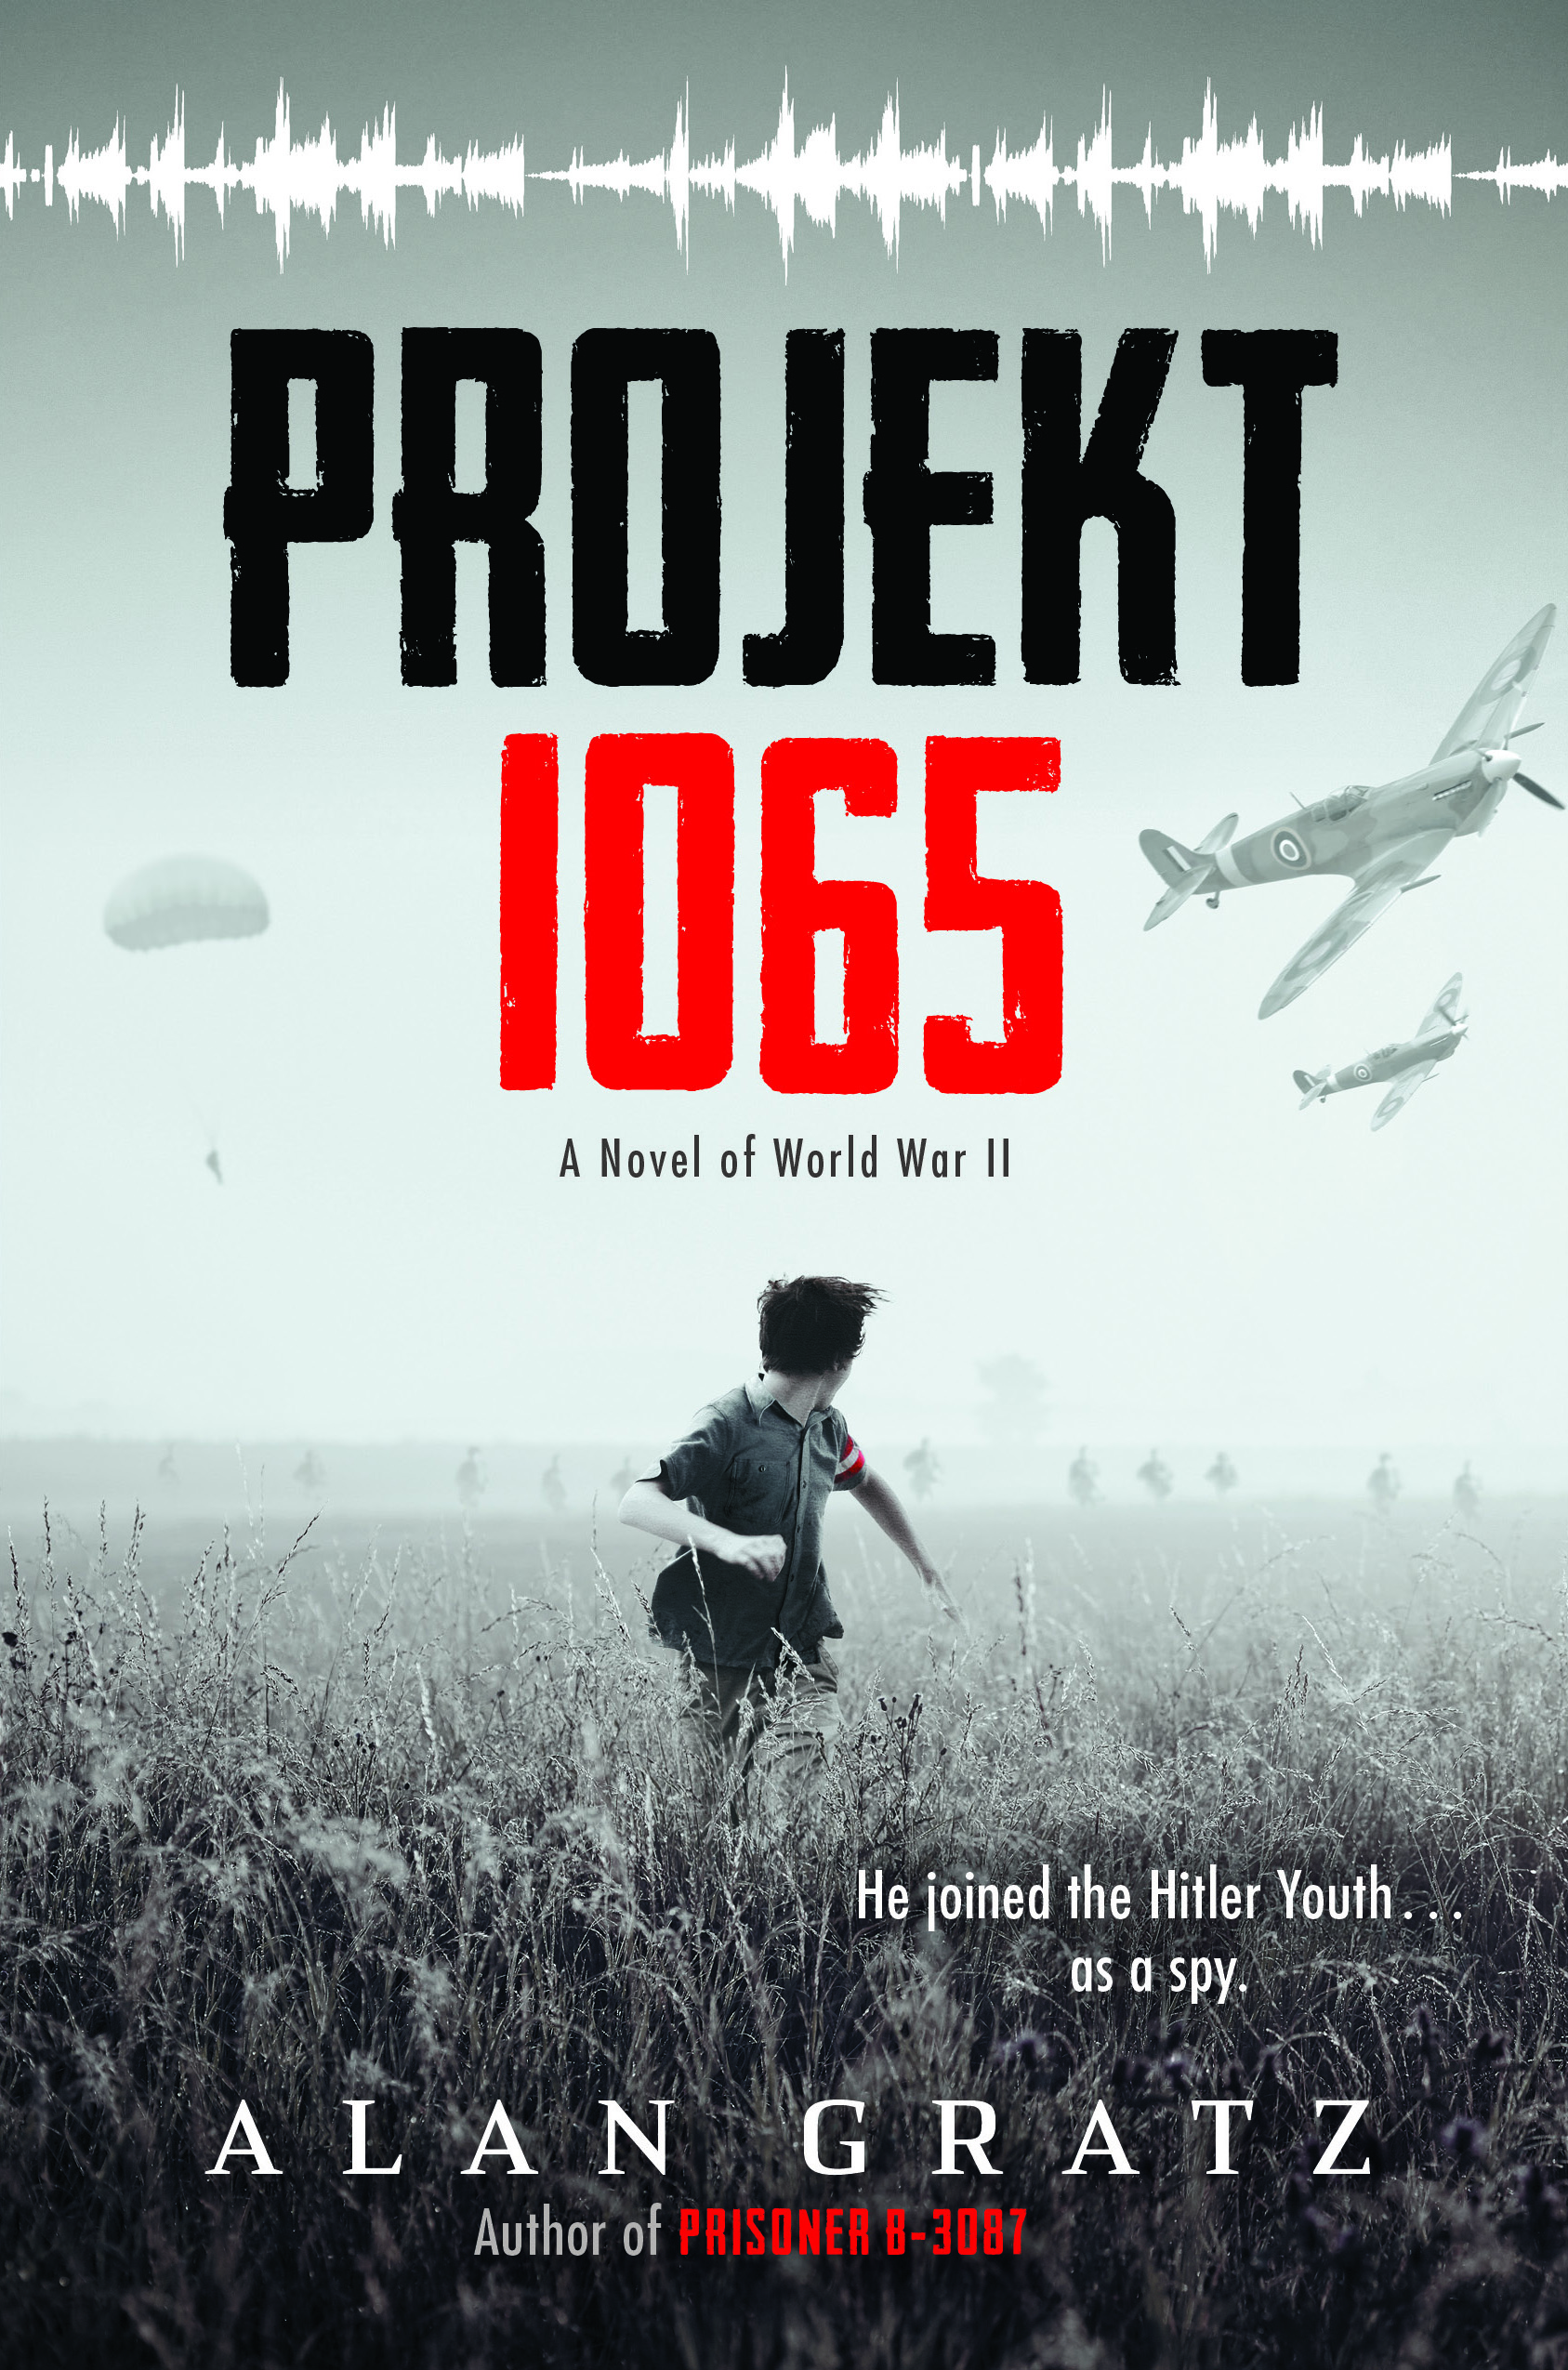 Projekt 1065 Cover 2550px copy.jpg